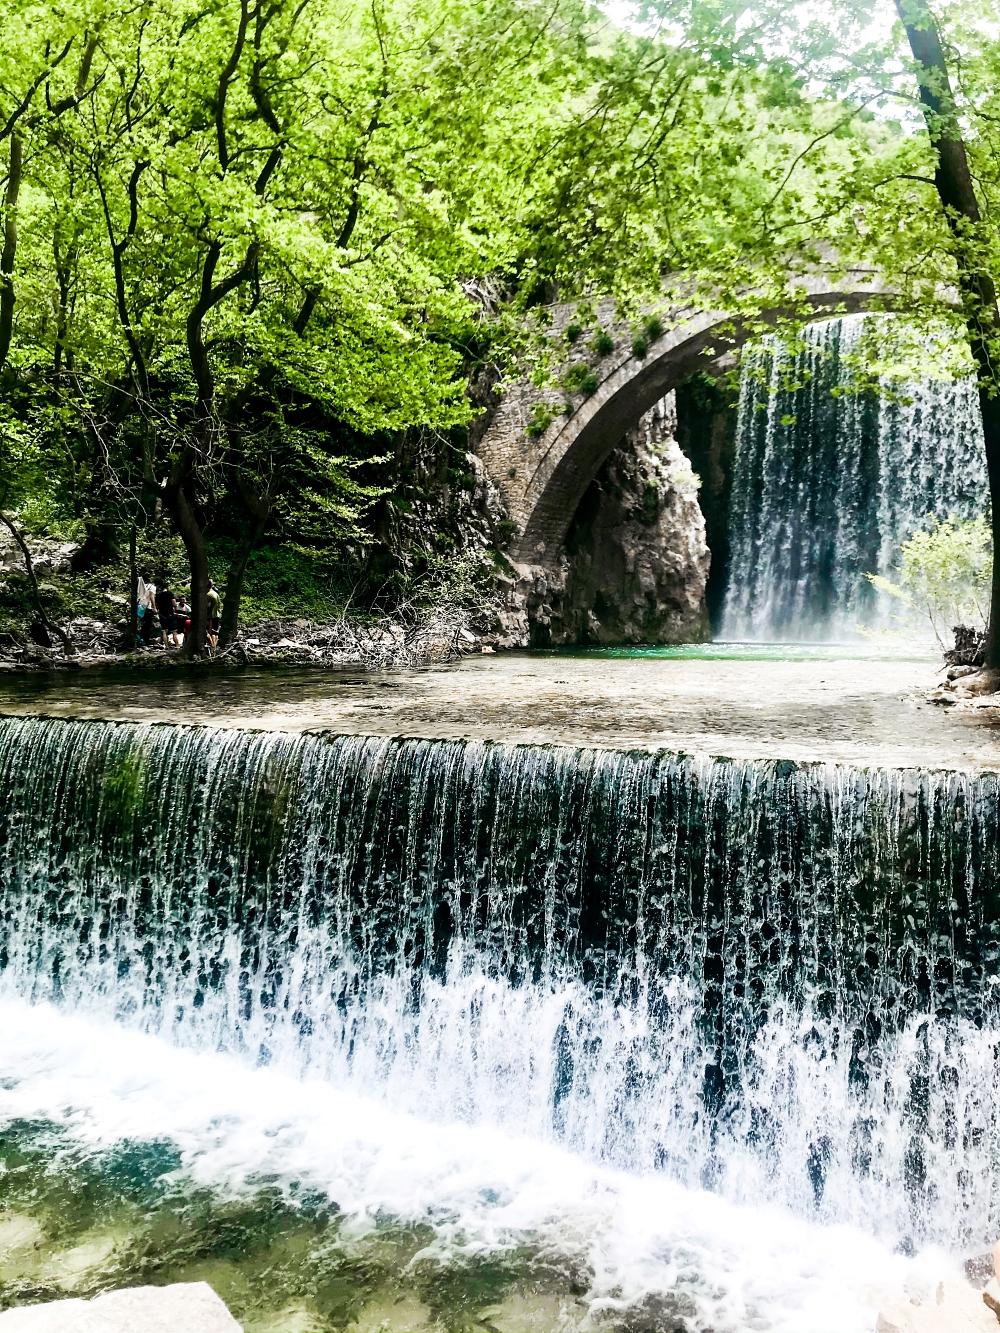 Palaiokarya waterfall bridge stone, Palaiokarya kataraktes, most beautiful waterfalls, Greece nature